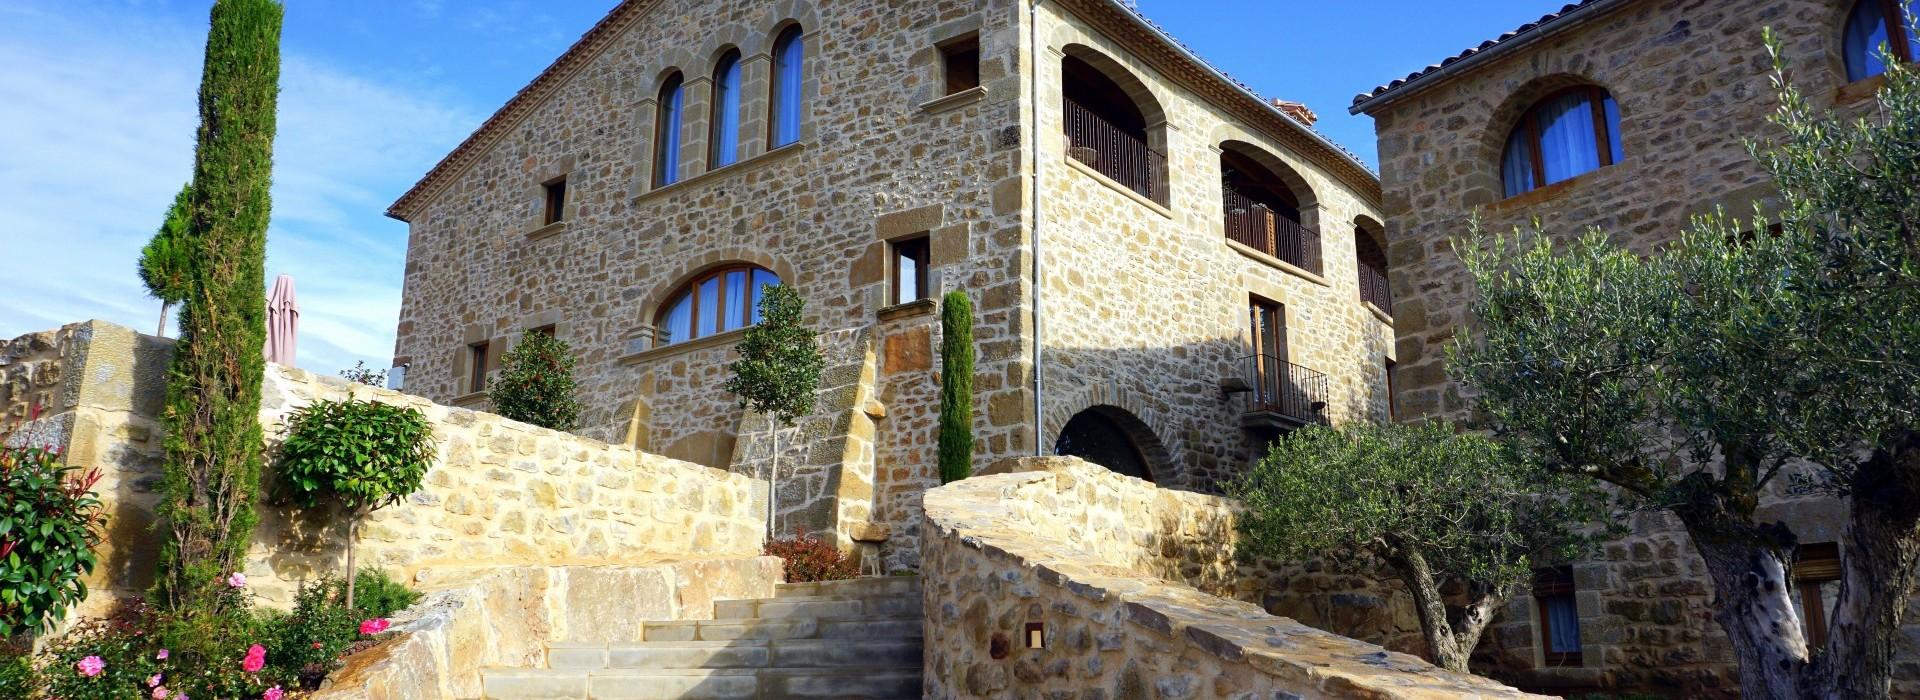 ancient-architecture-beautiful-434531.jpg